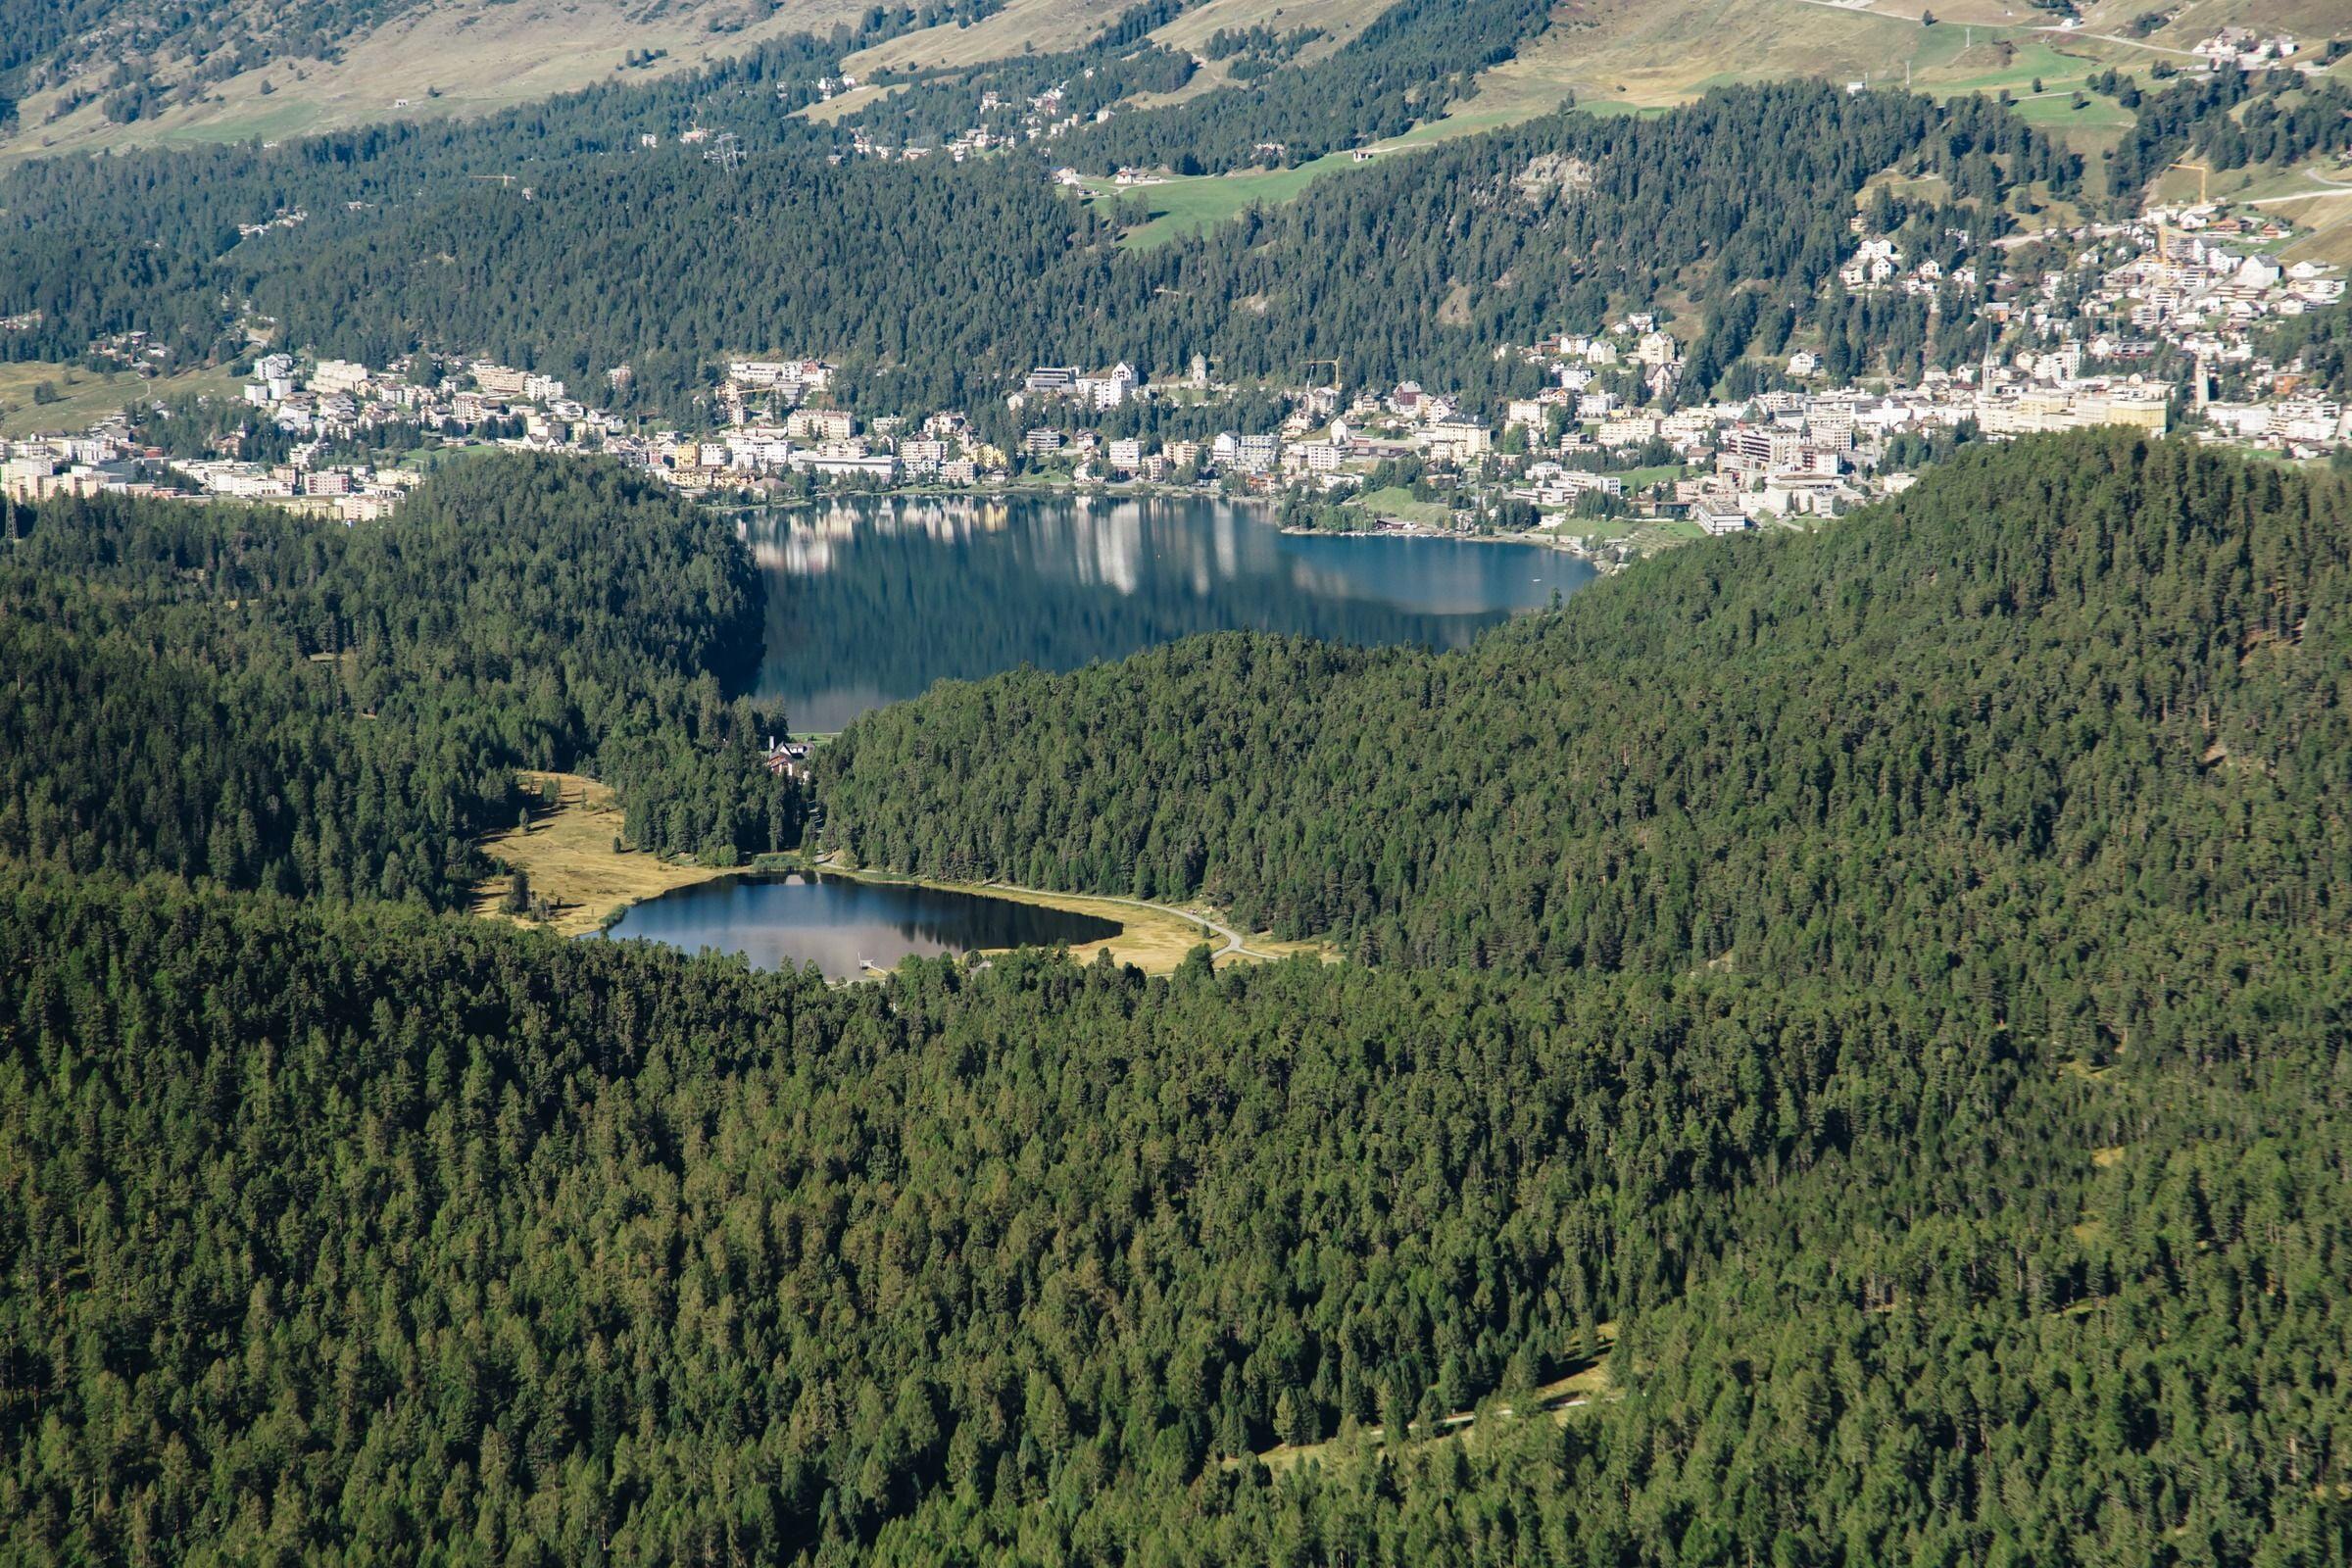 Lej da Staz oberhalb von St. Moritz